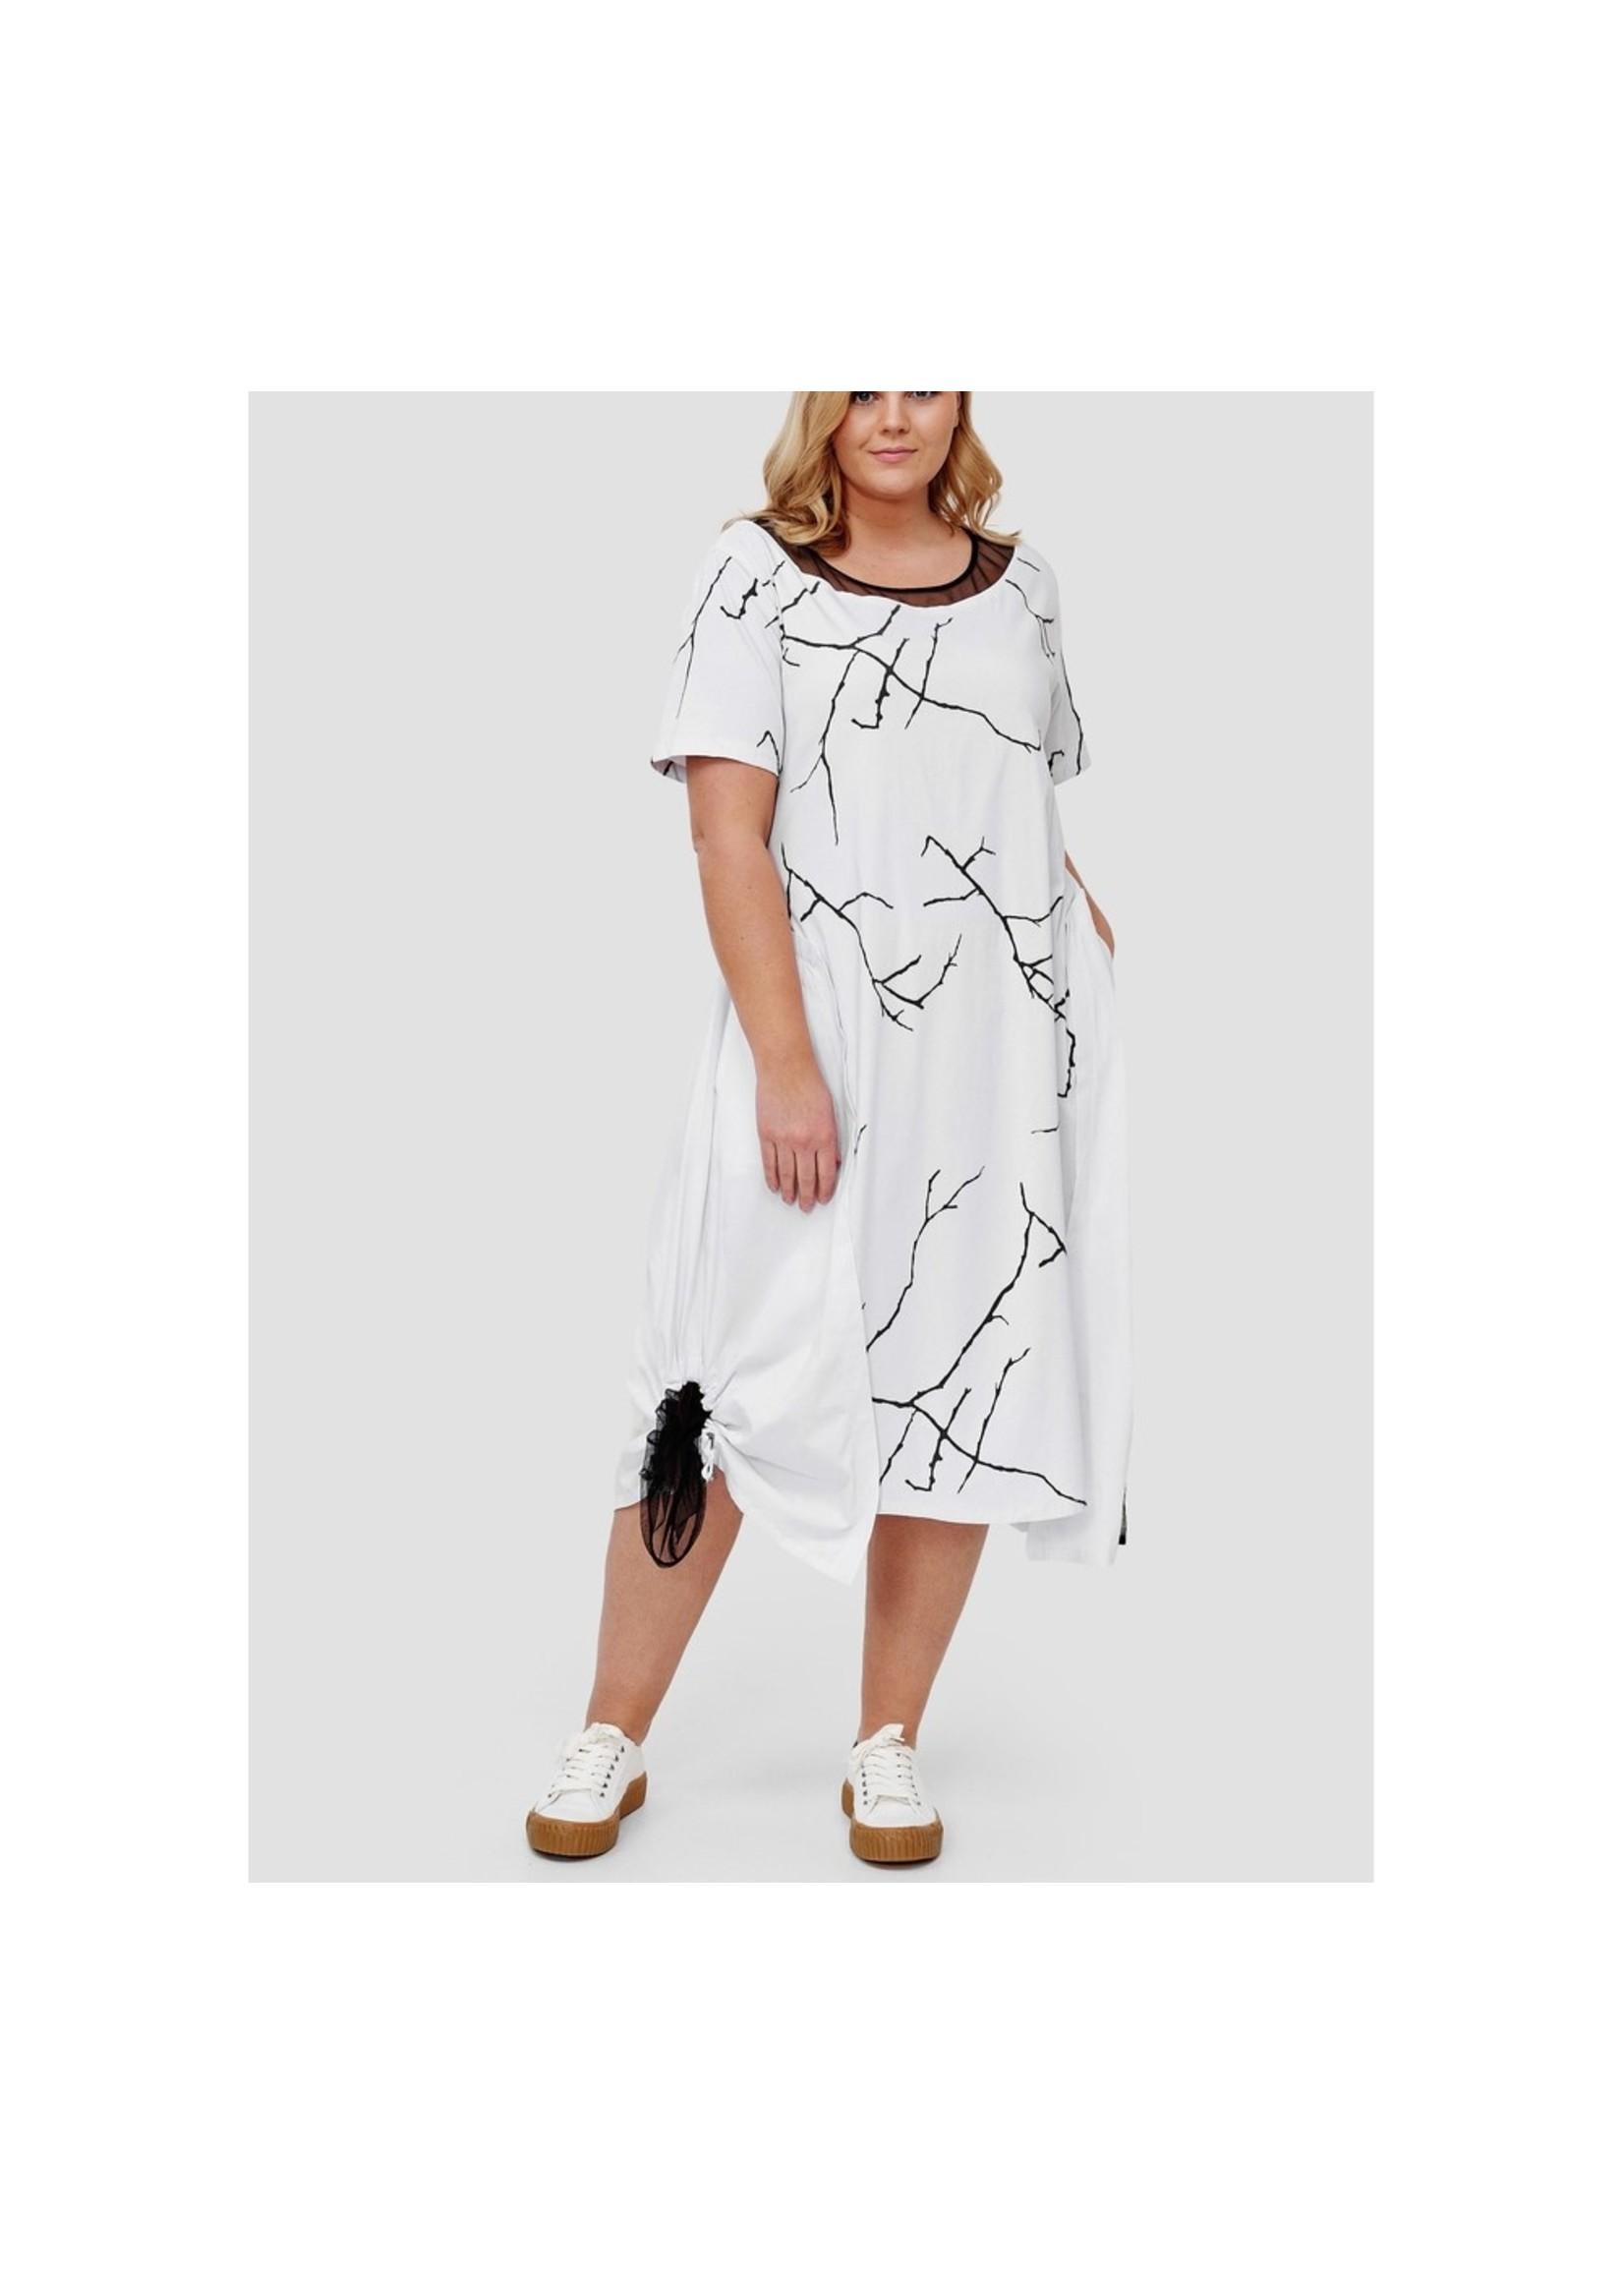 KEKOO 1223253 dress